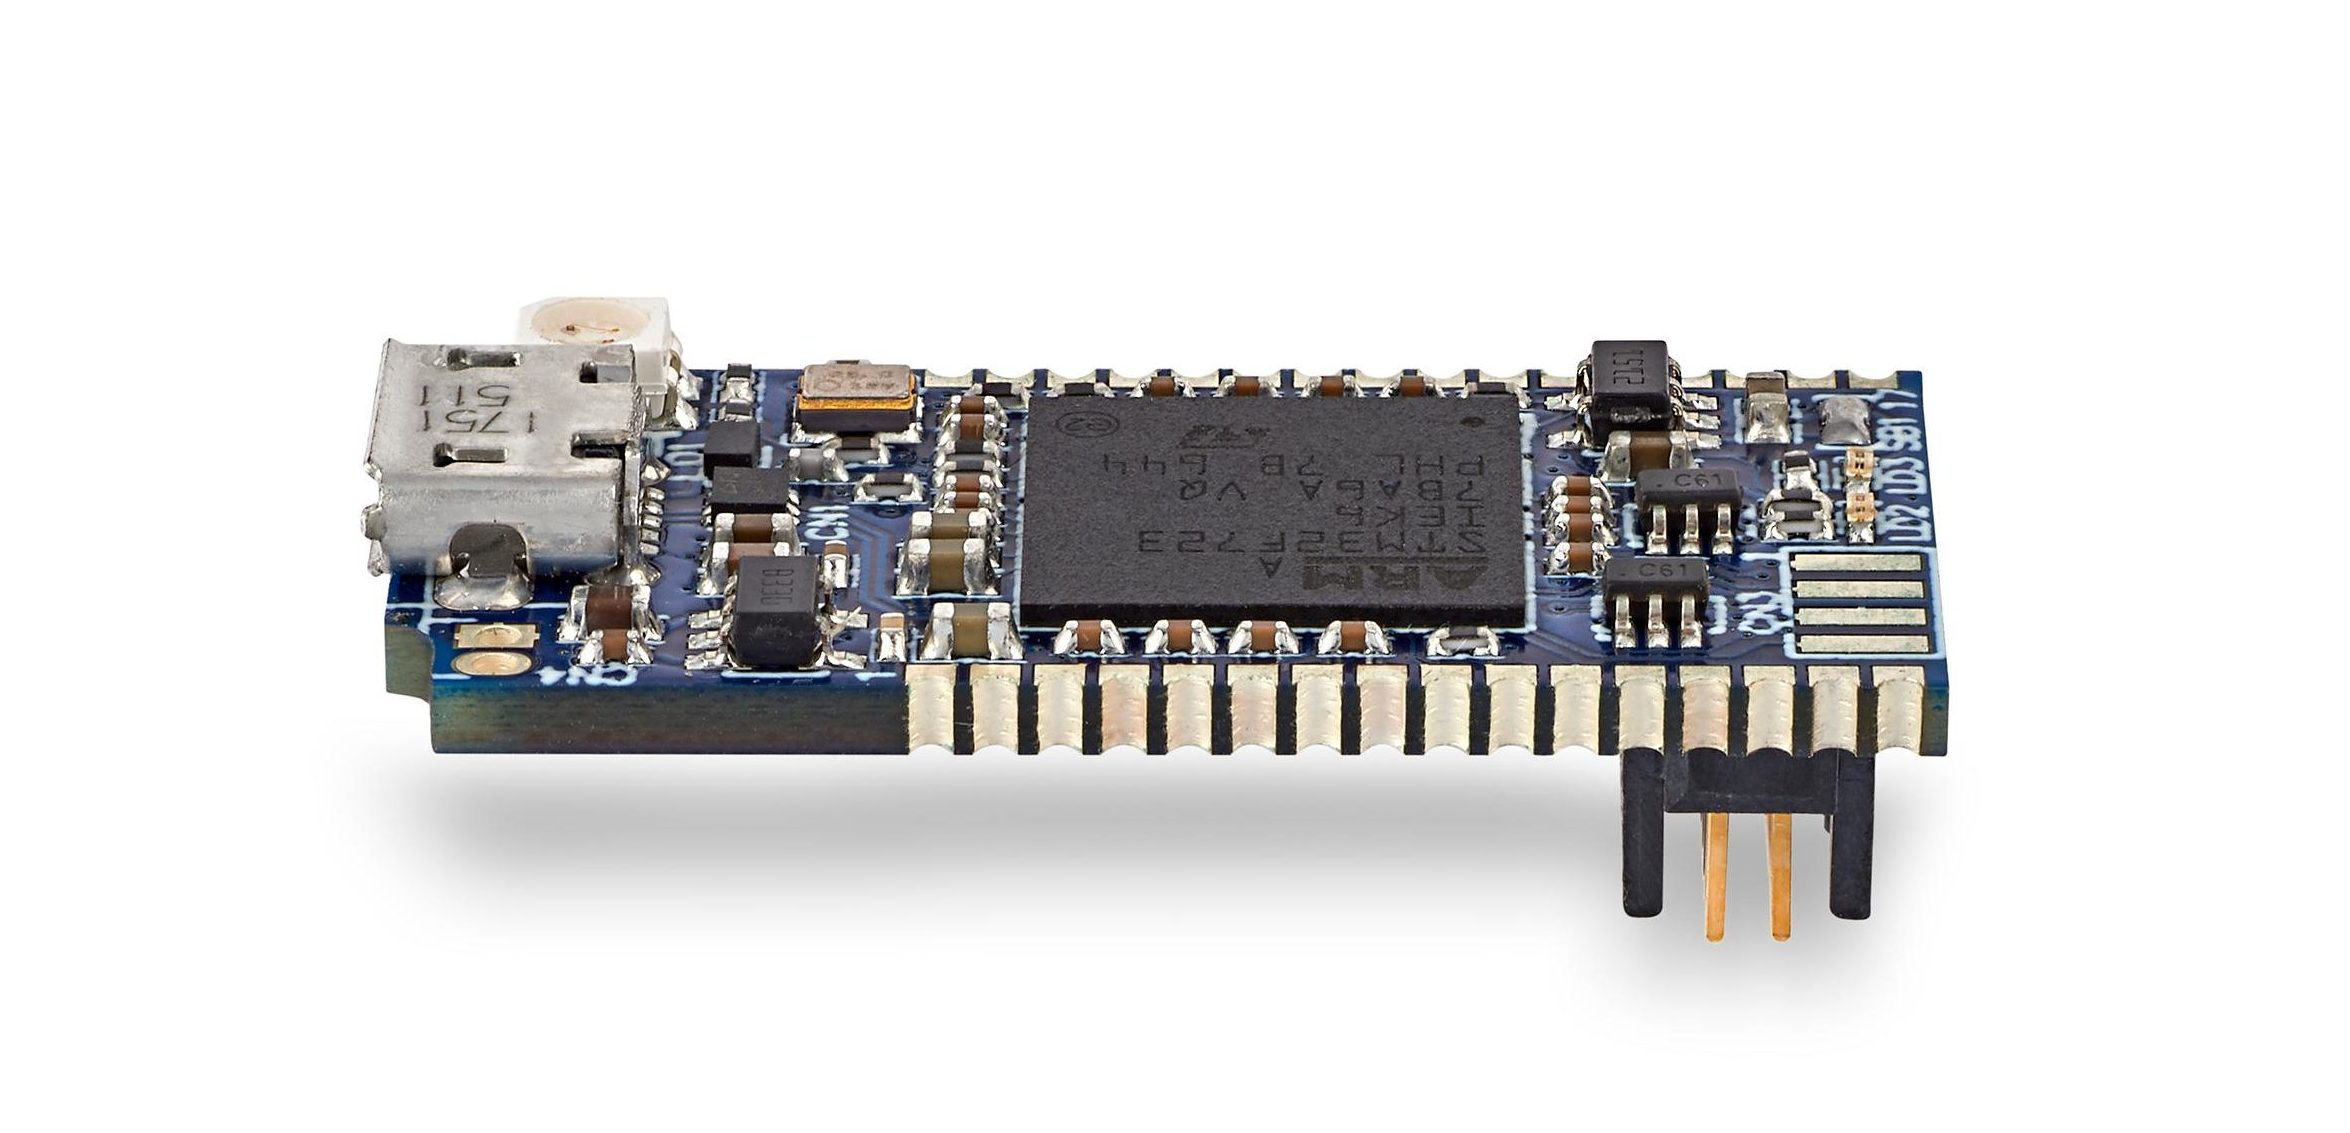 Compact debug probe accelerates STM32 application development